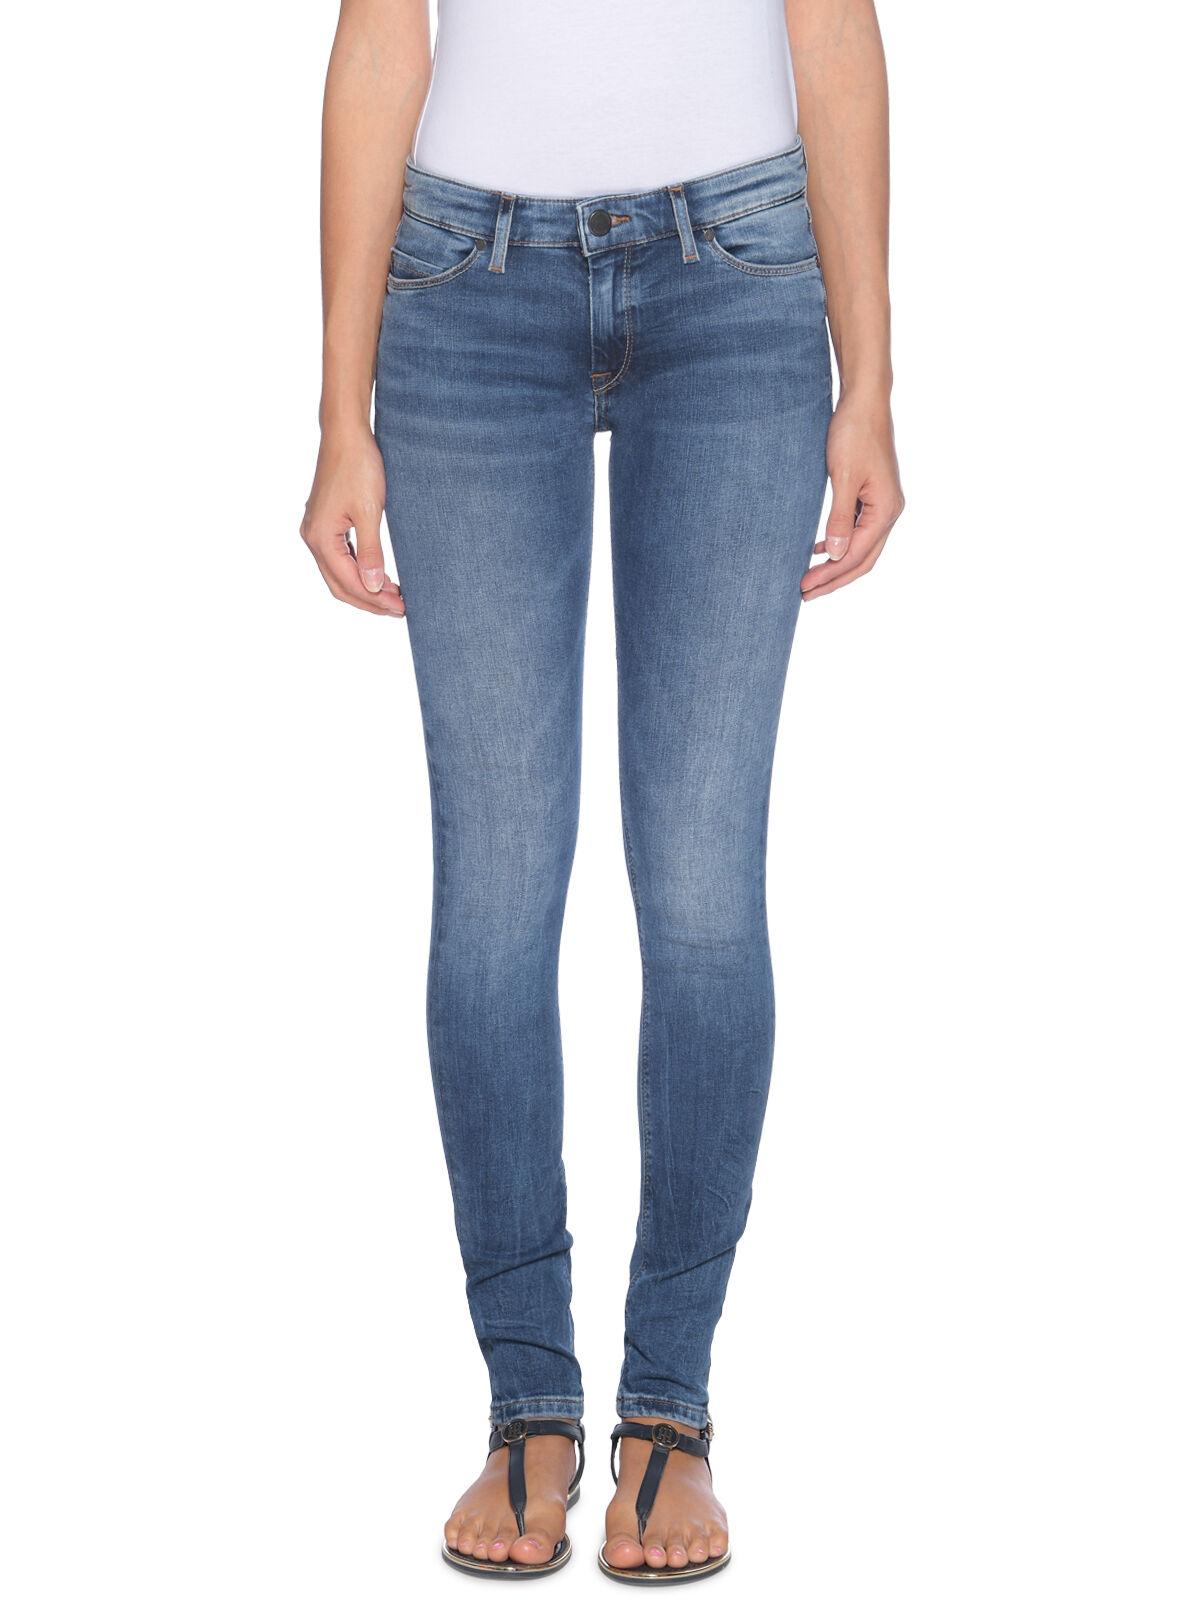 Siv Jeans